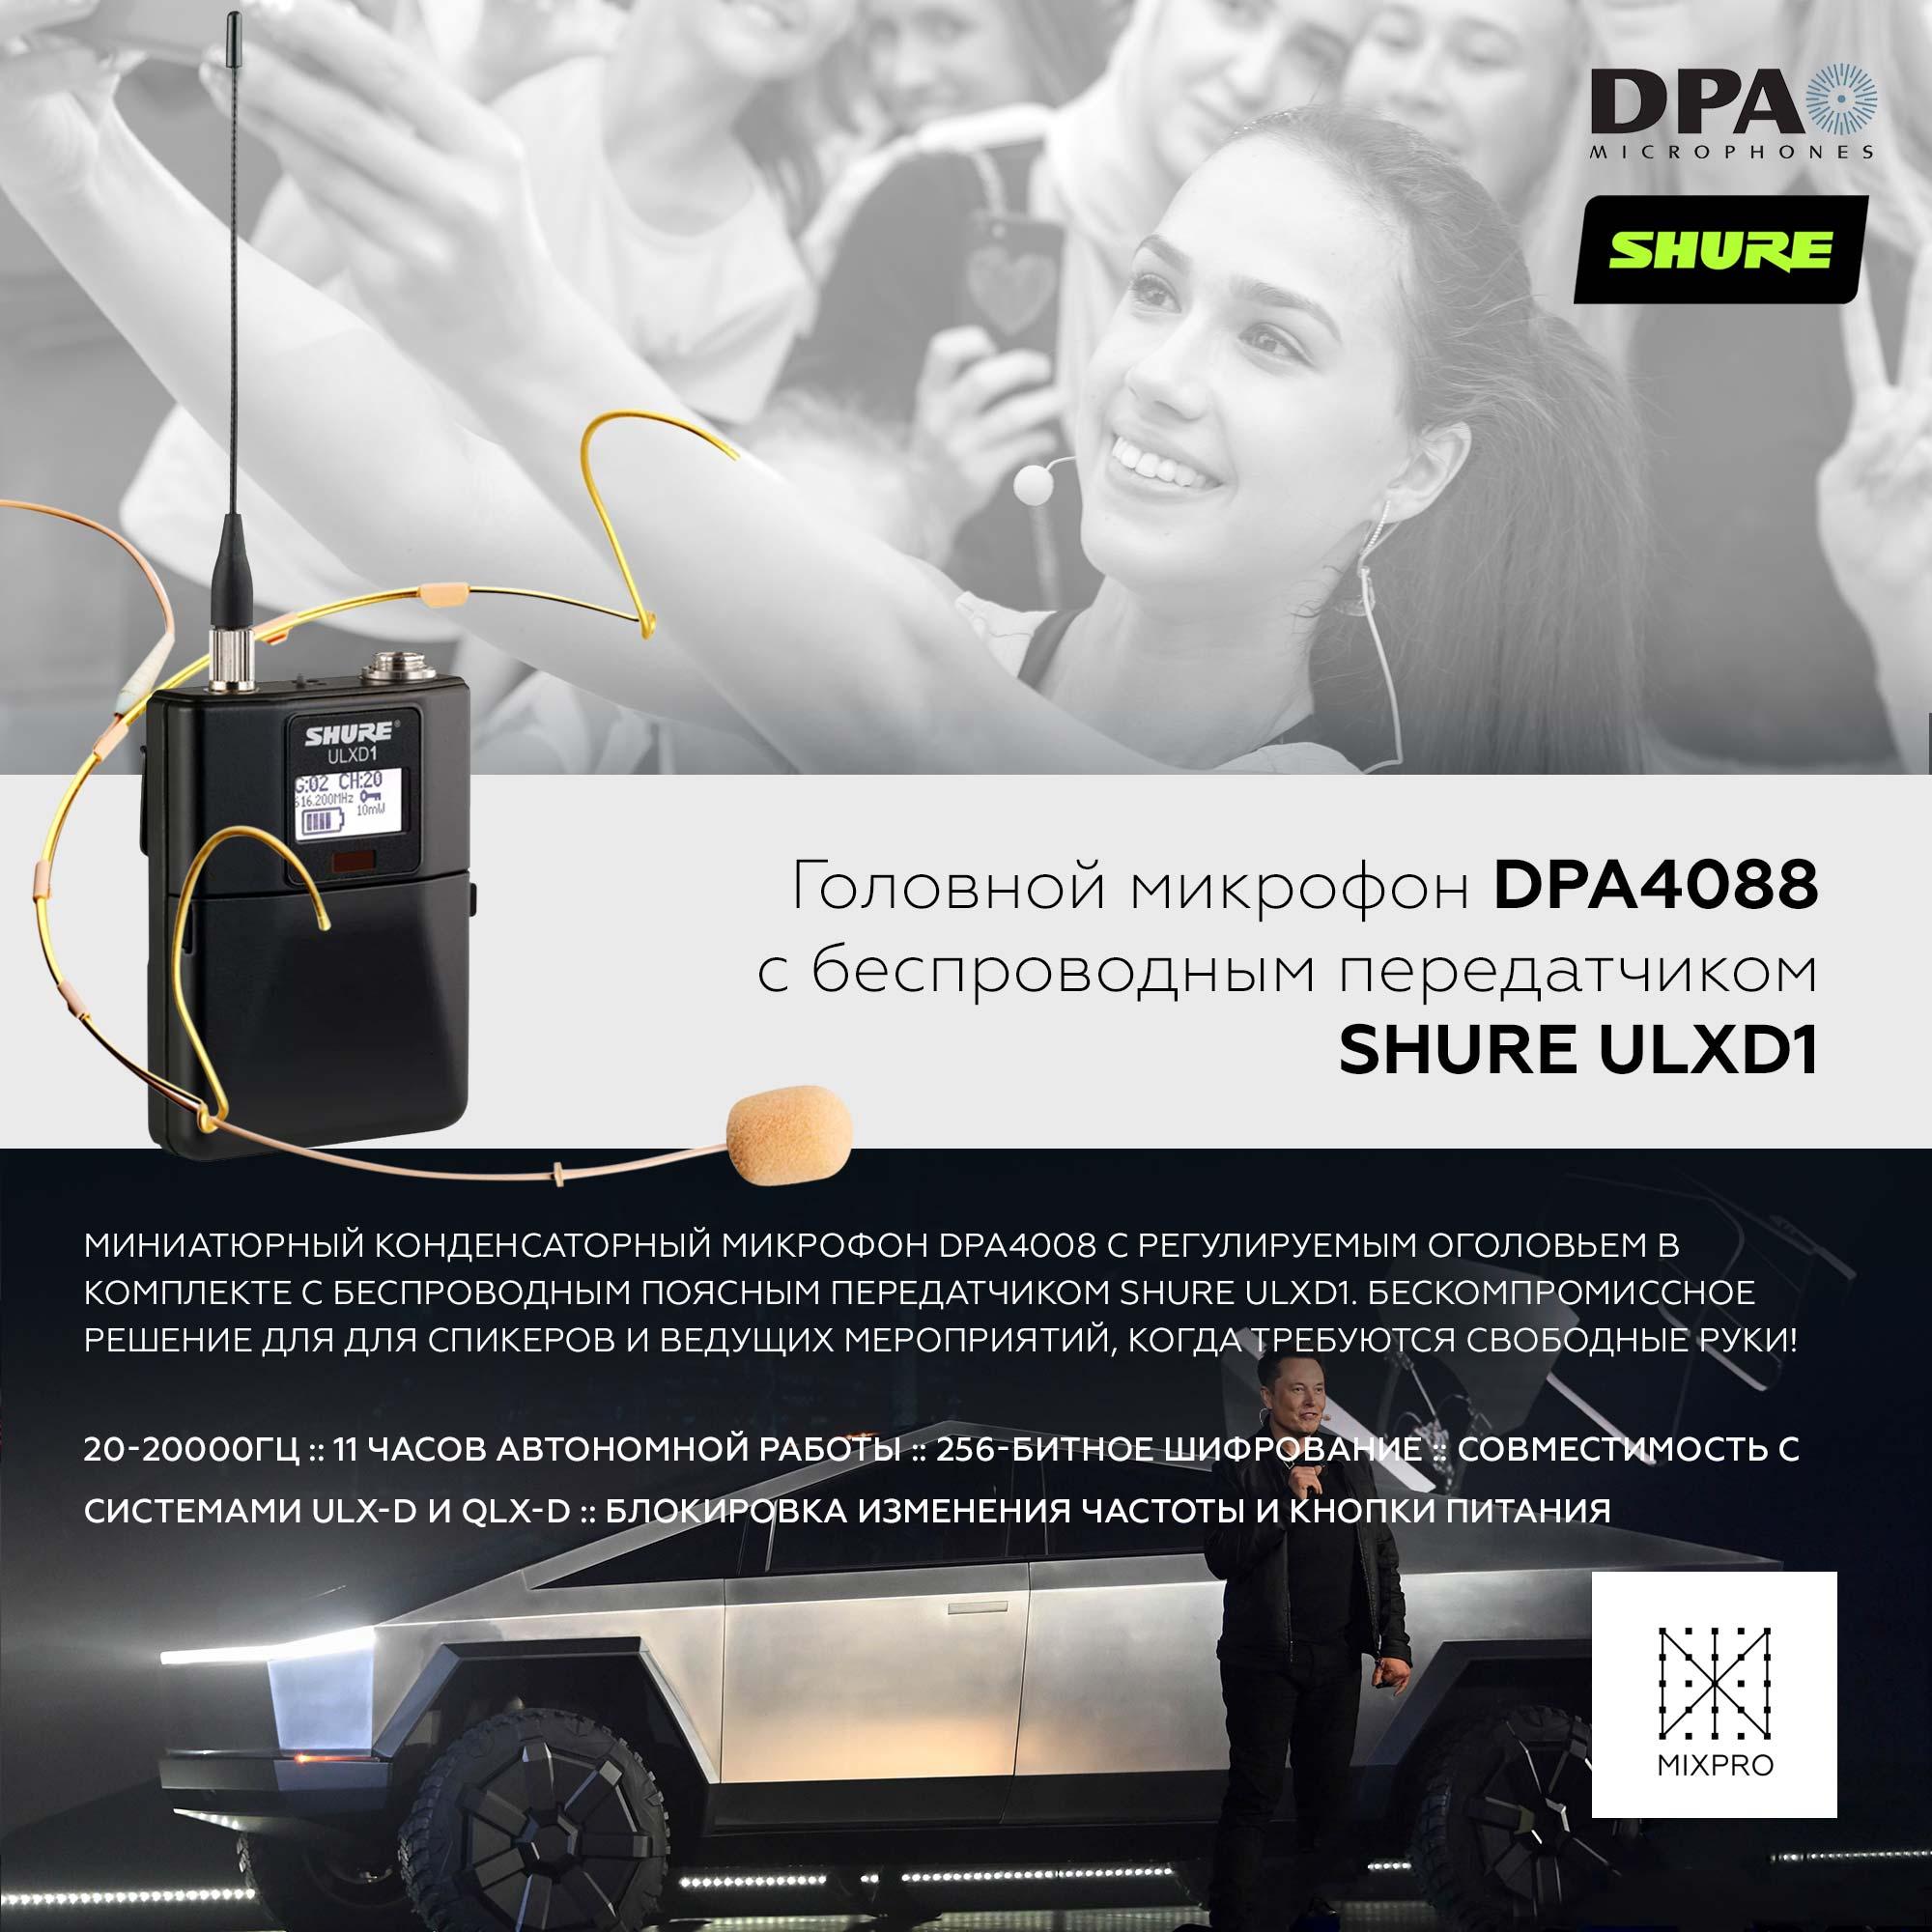 SHURE ULXD1 + DPA 4088<br><br>